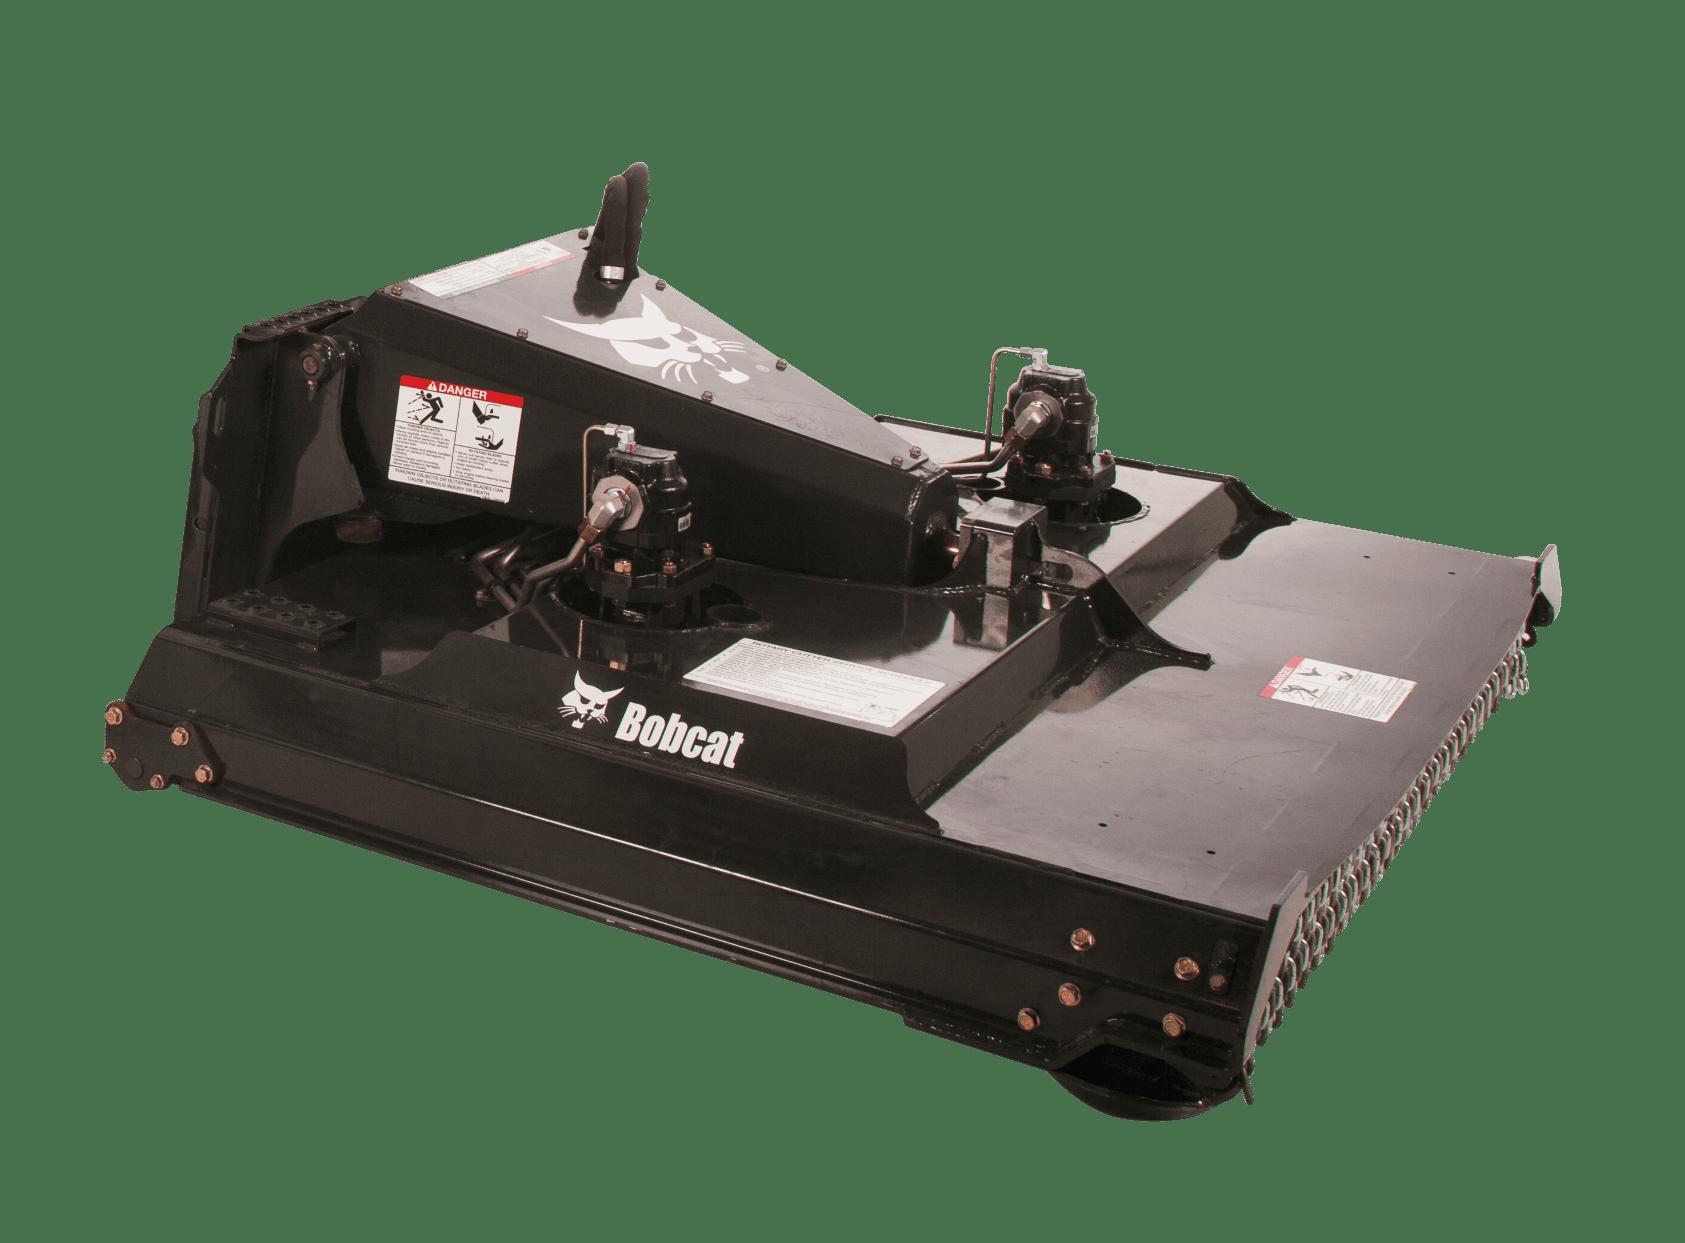 Brushcat rotary cutter - Bobcat